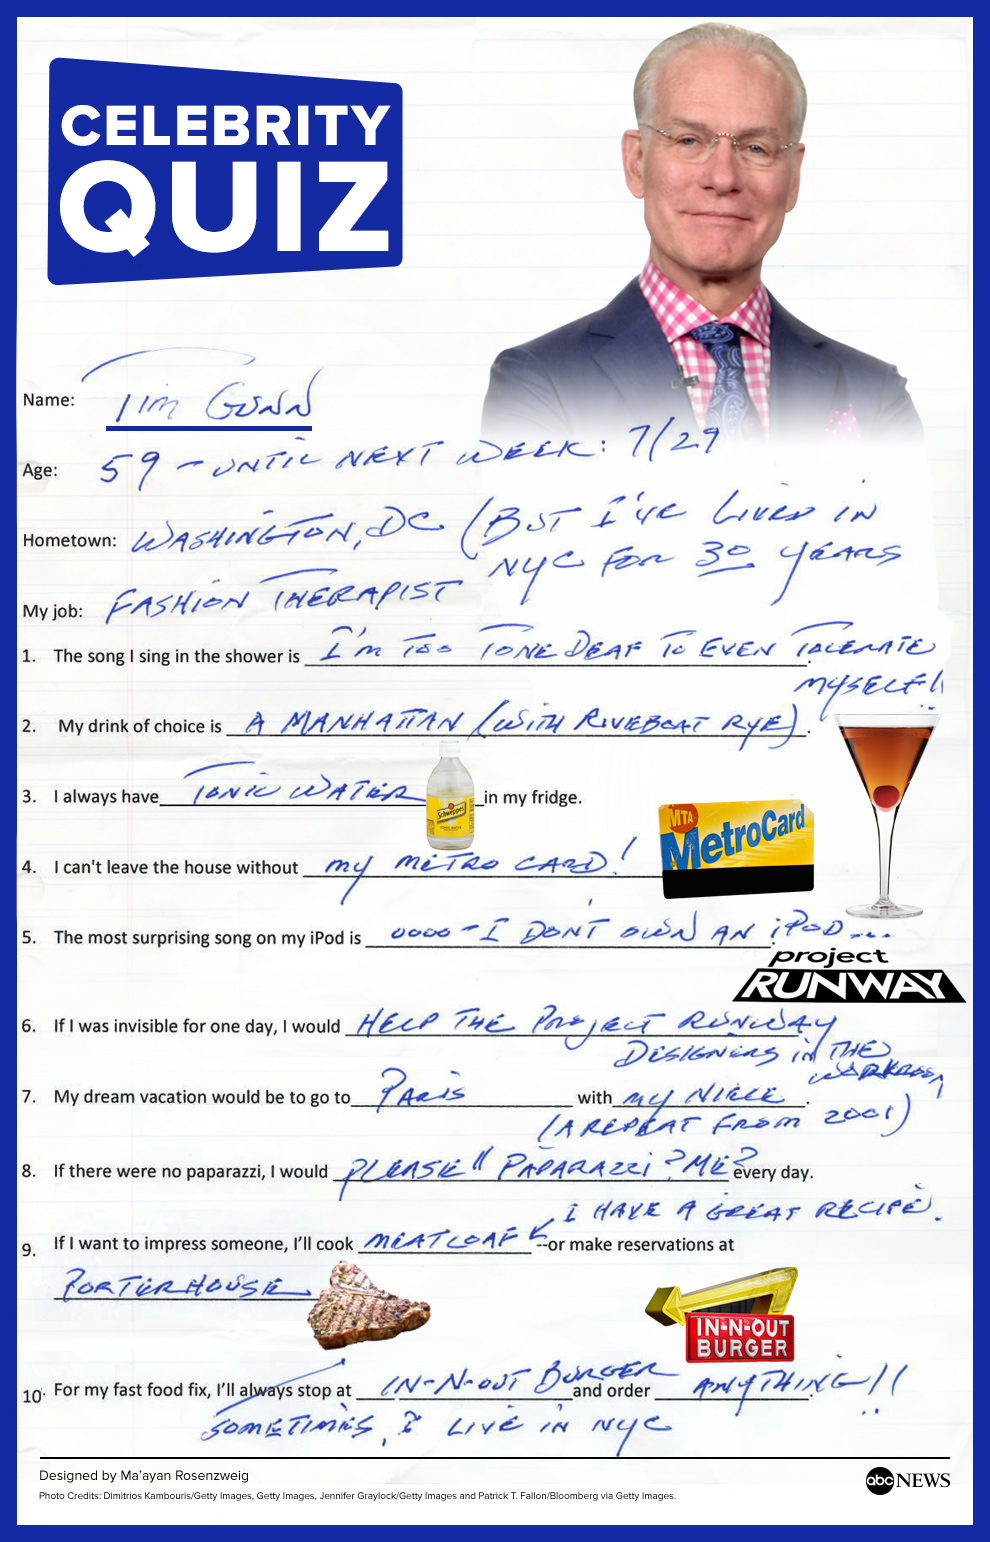 tim gunn tackles the abc news quiz in his handwriting